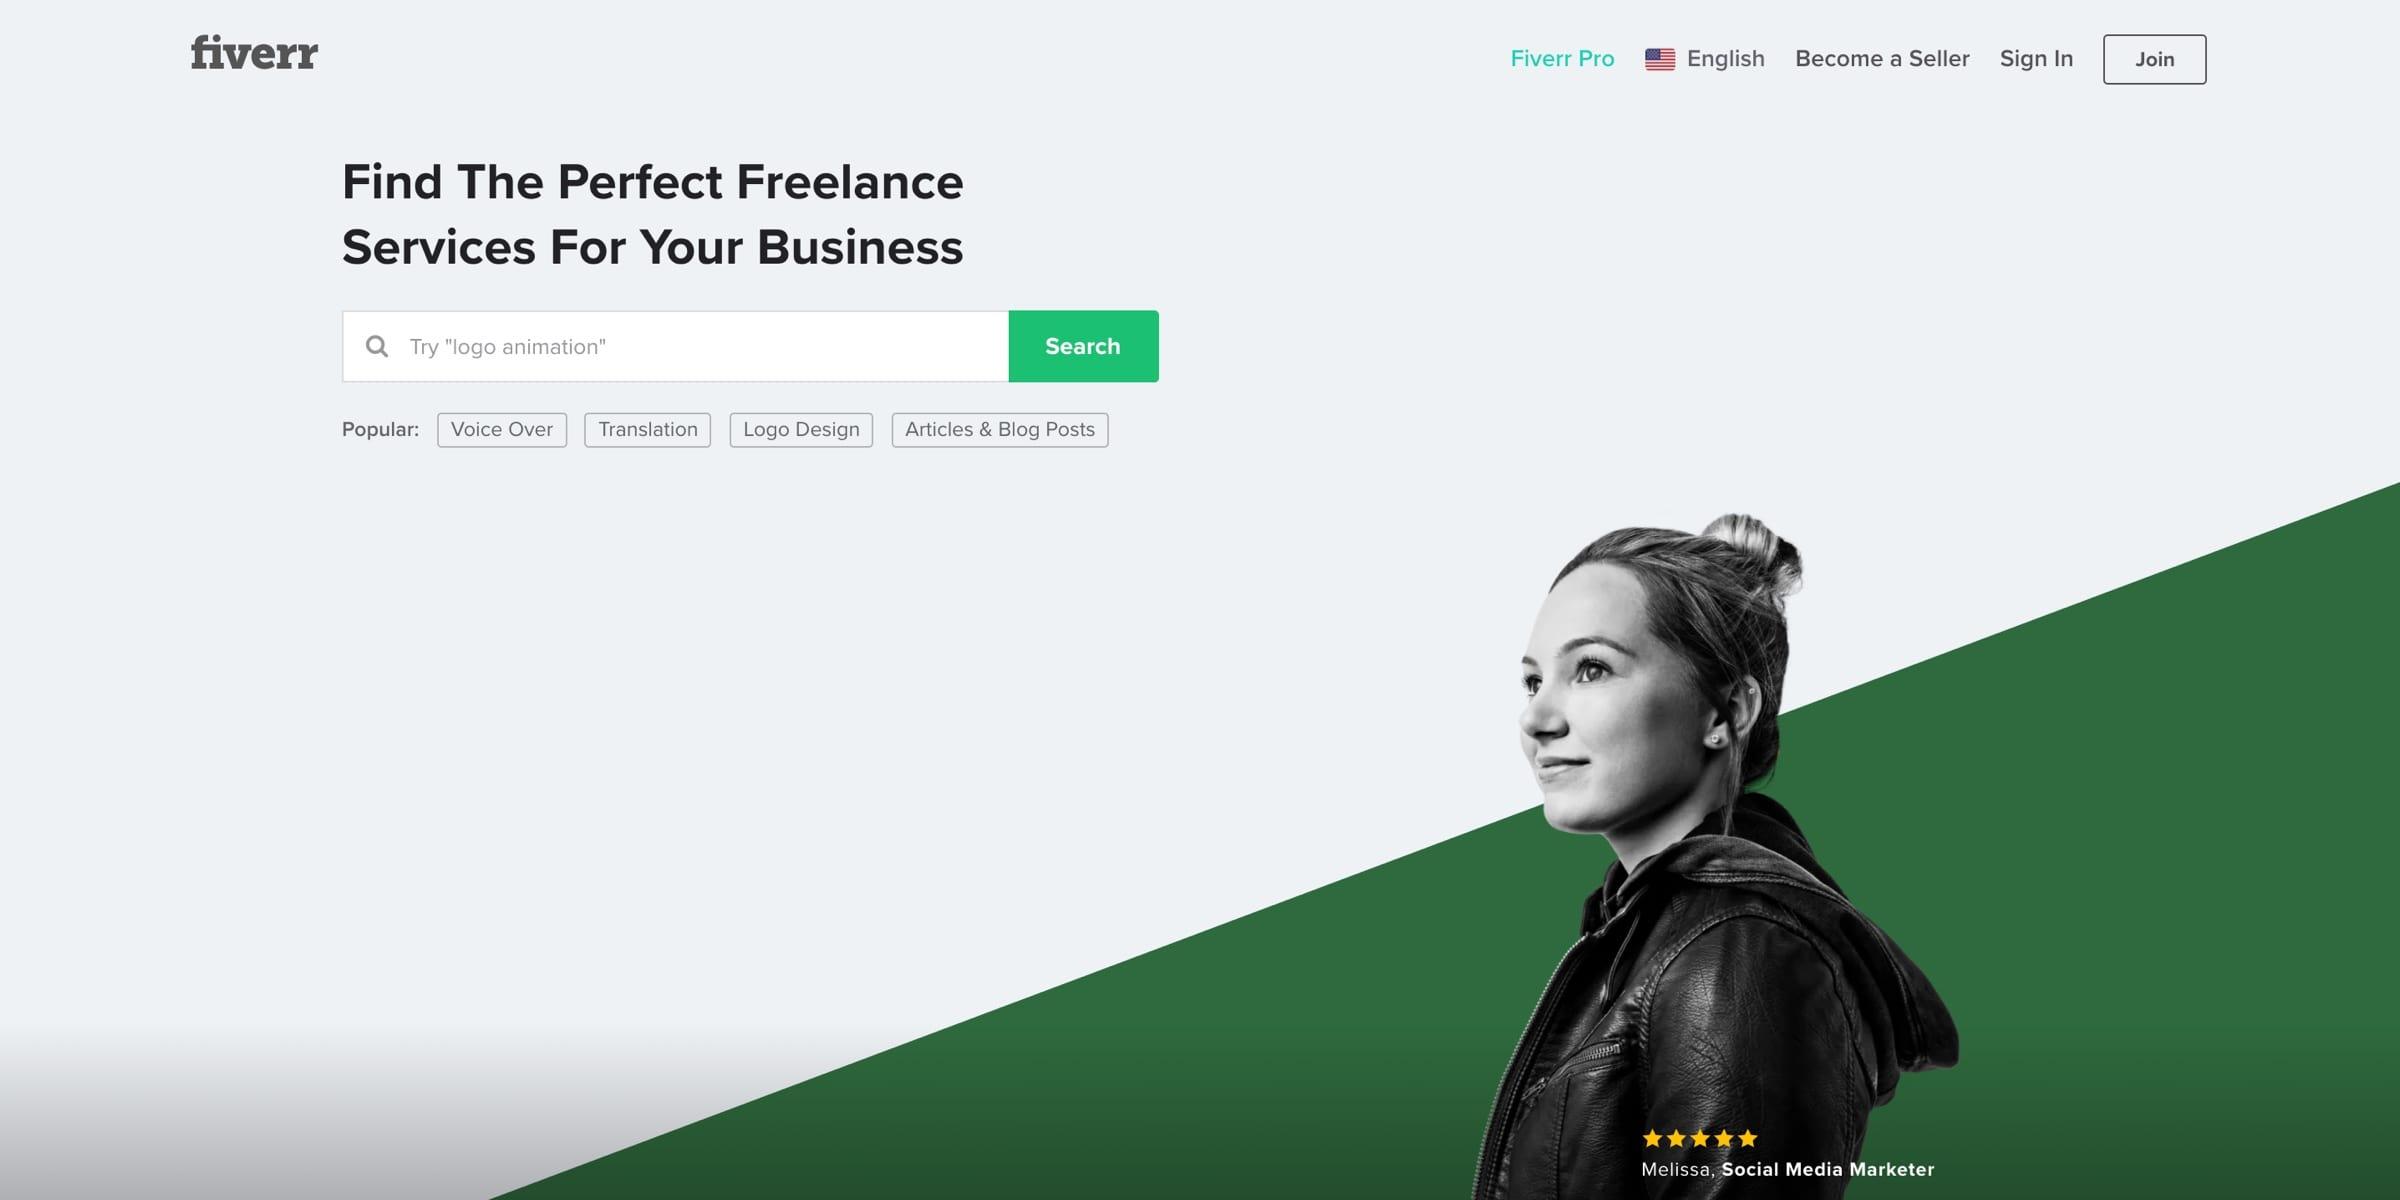 Fiverr utilizing green color psychology in their design